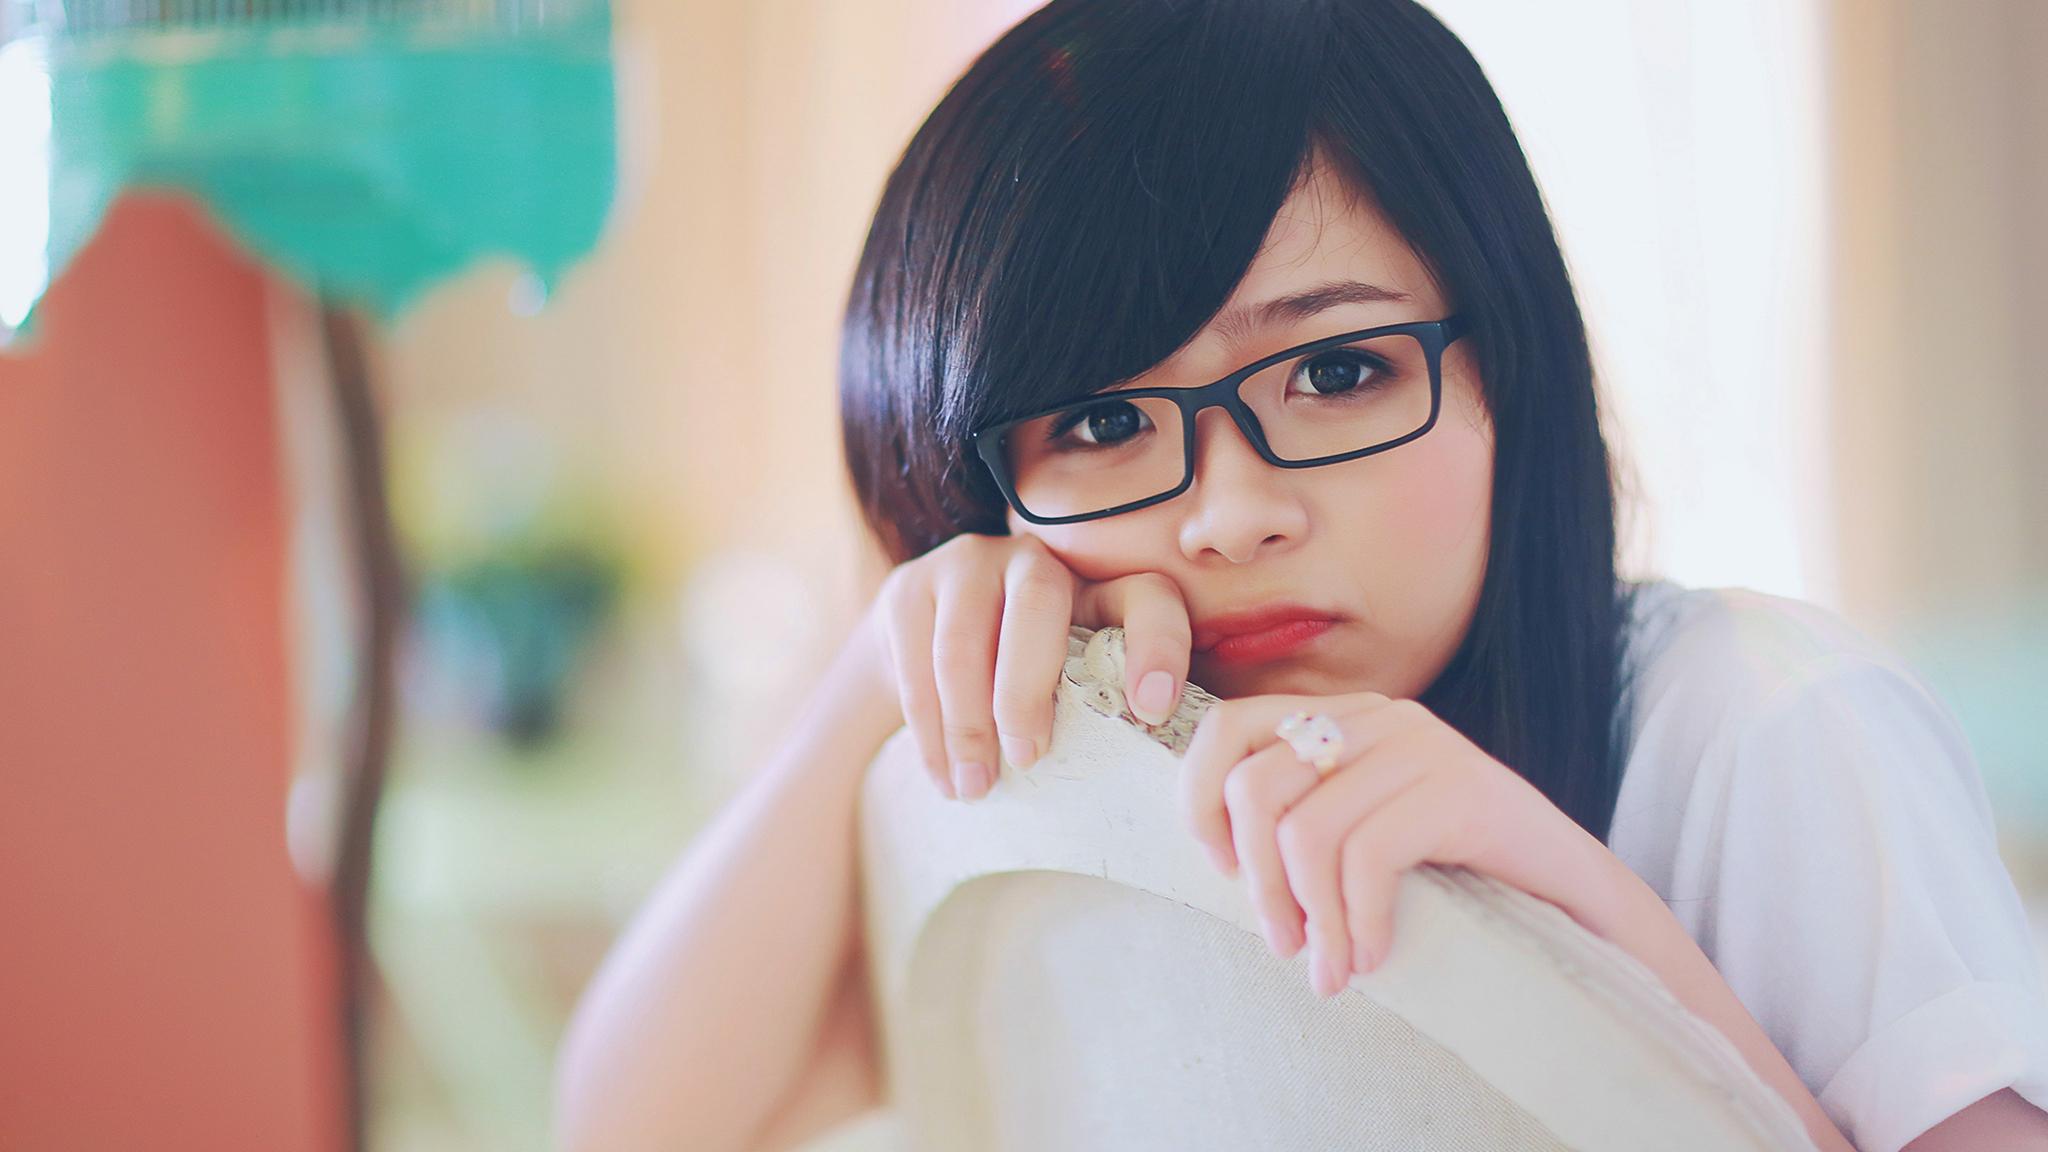 Vn Teen Girls Wallpapers Collection - Asian Girl Wallpapers Hd , HD Wallpaper & Backgrounds